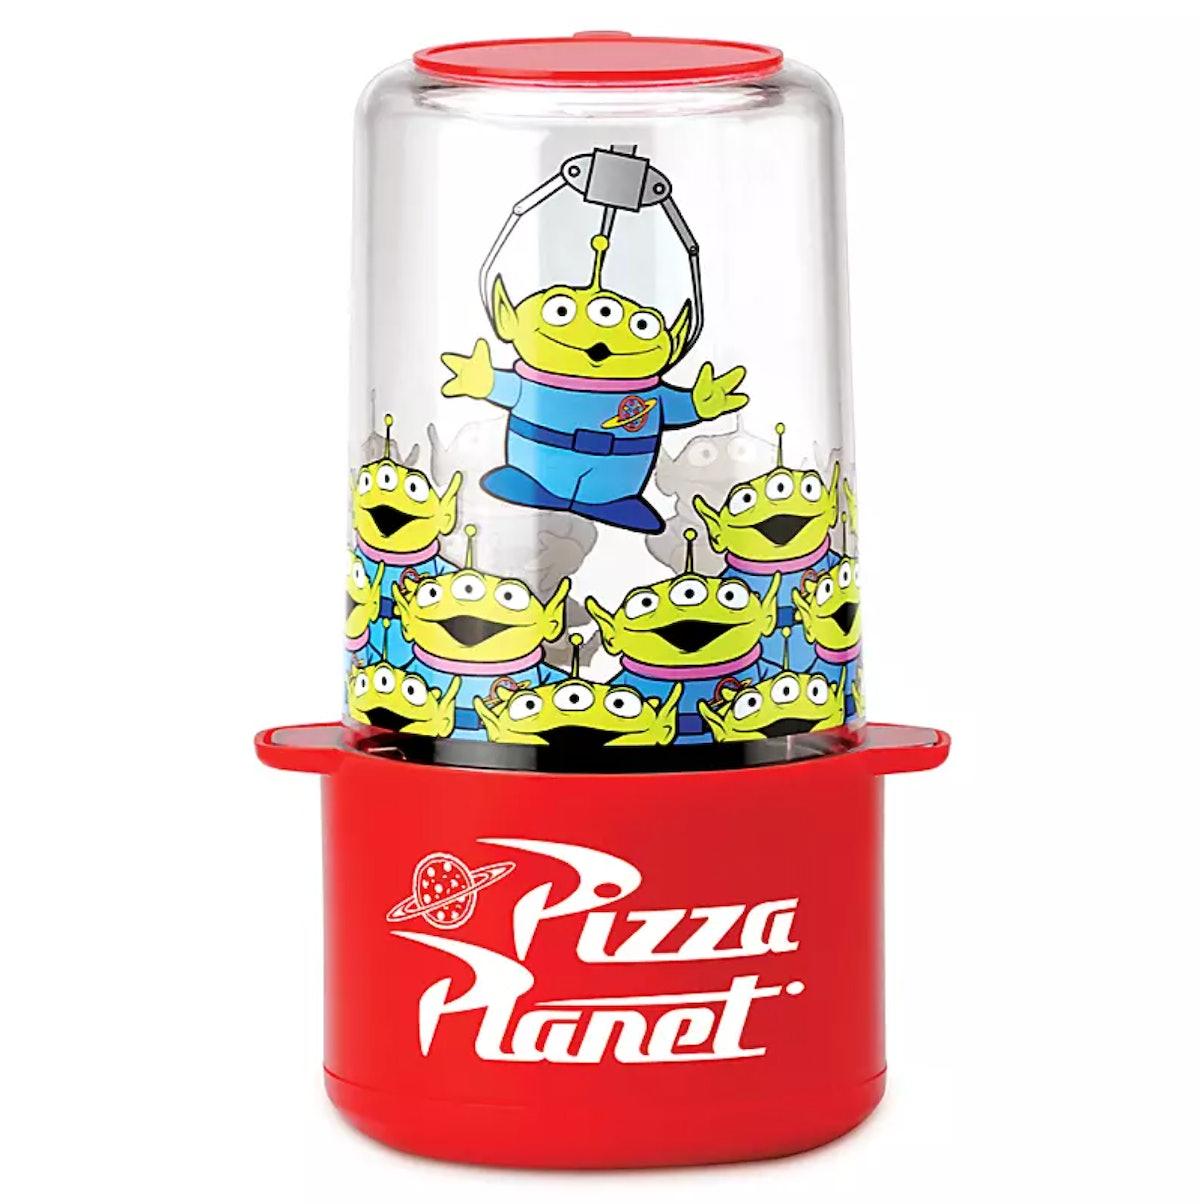 Pizza Planet Popcorn Popper – Toy Story